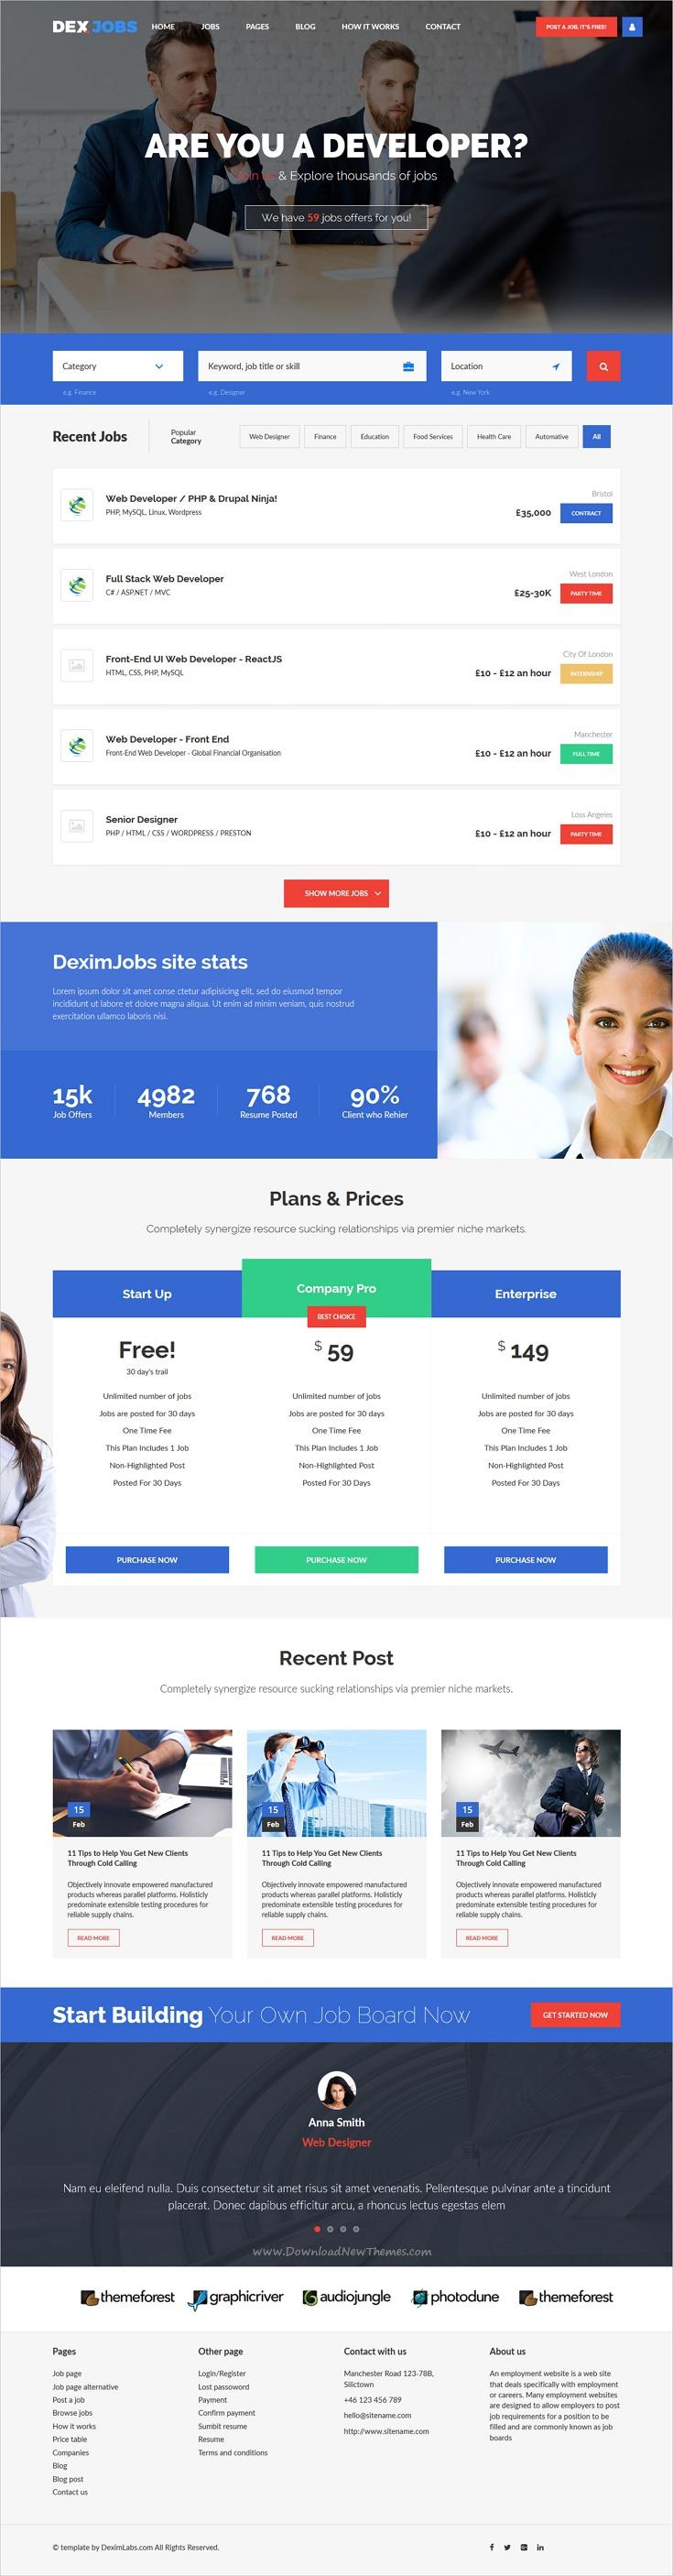 job pro job board html template free download  Dexjobs Job Board HTML Template | Template